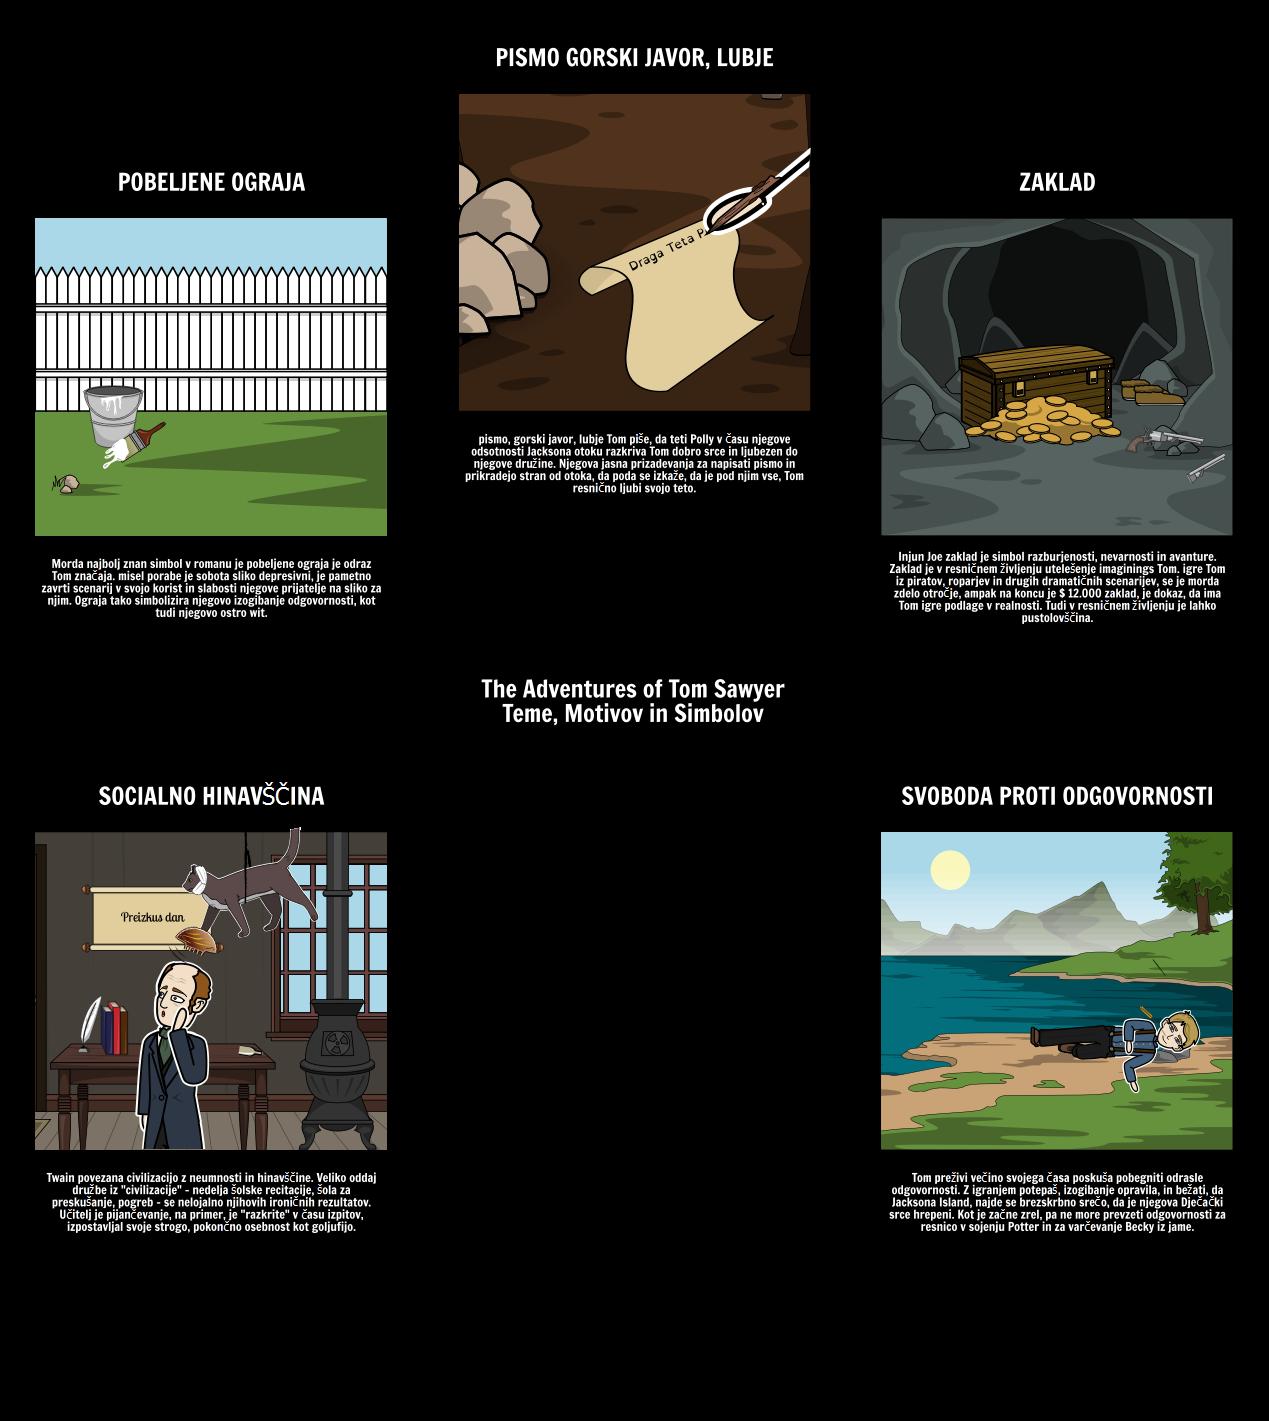 The Adventures of Tom Sawyer Teme, Motivov in Simbolov